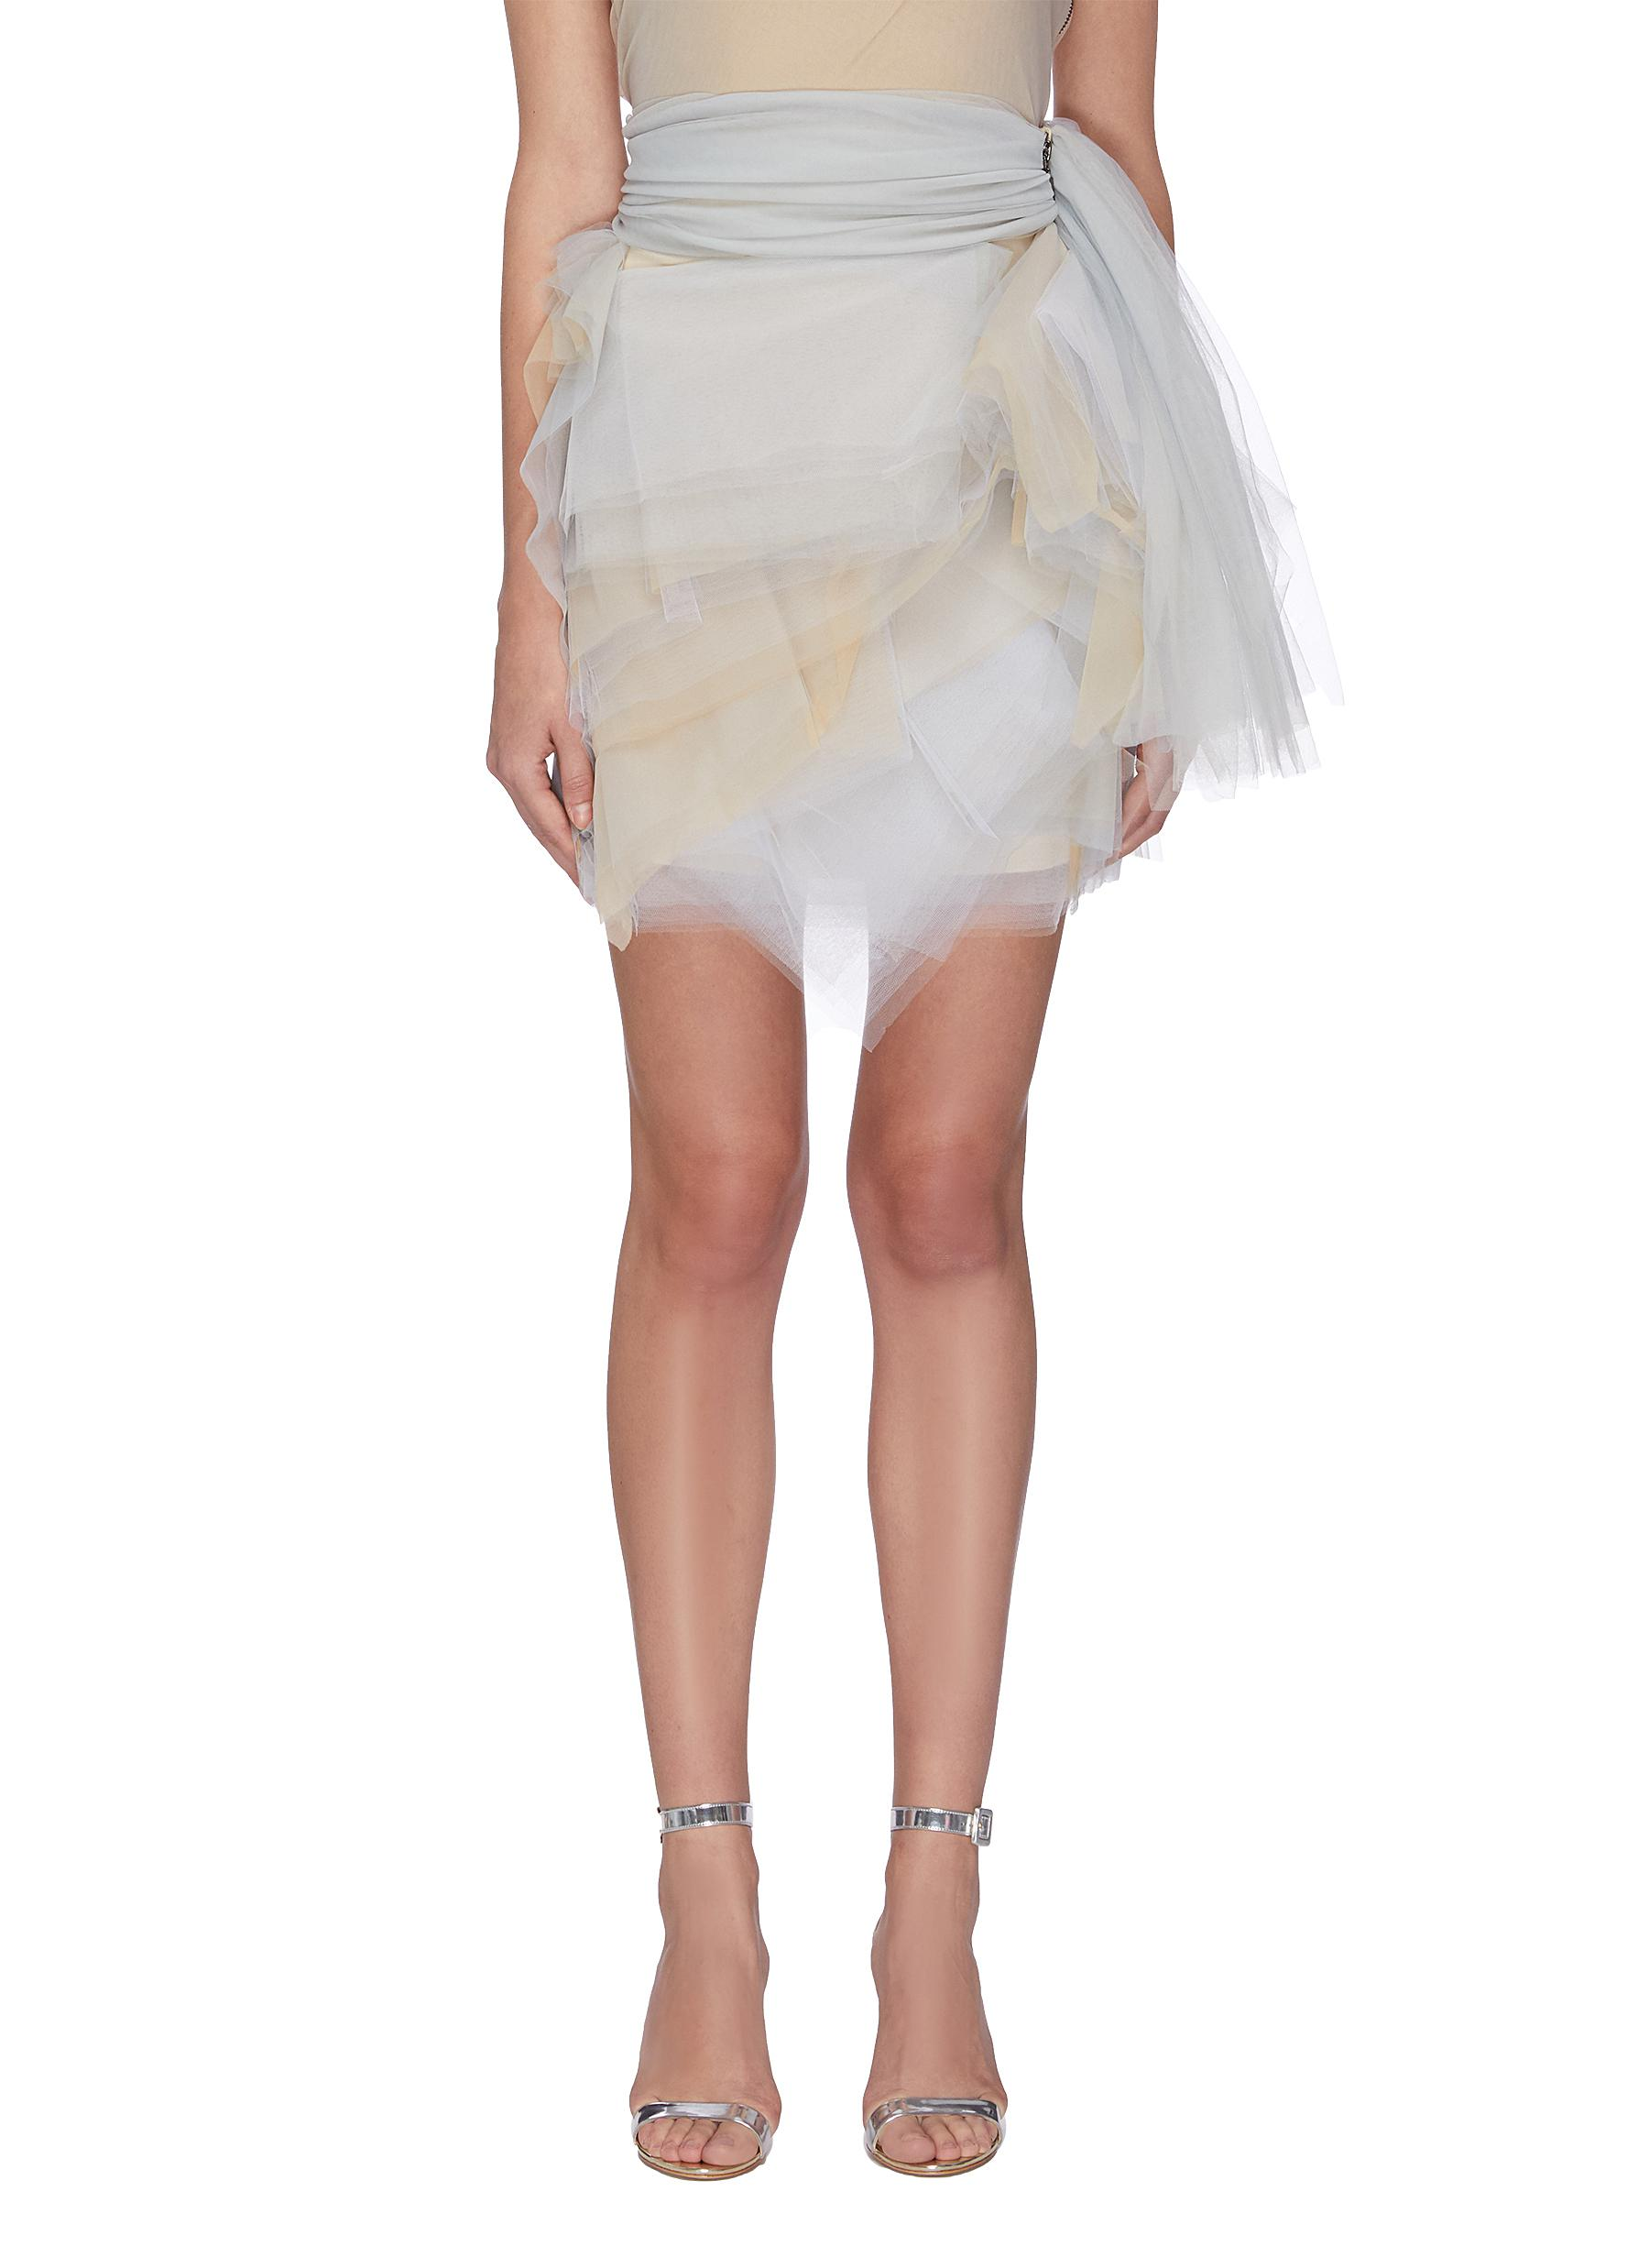 Hellum tulle mini skirt by Maticevski